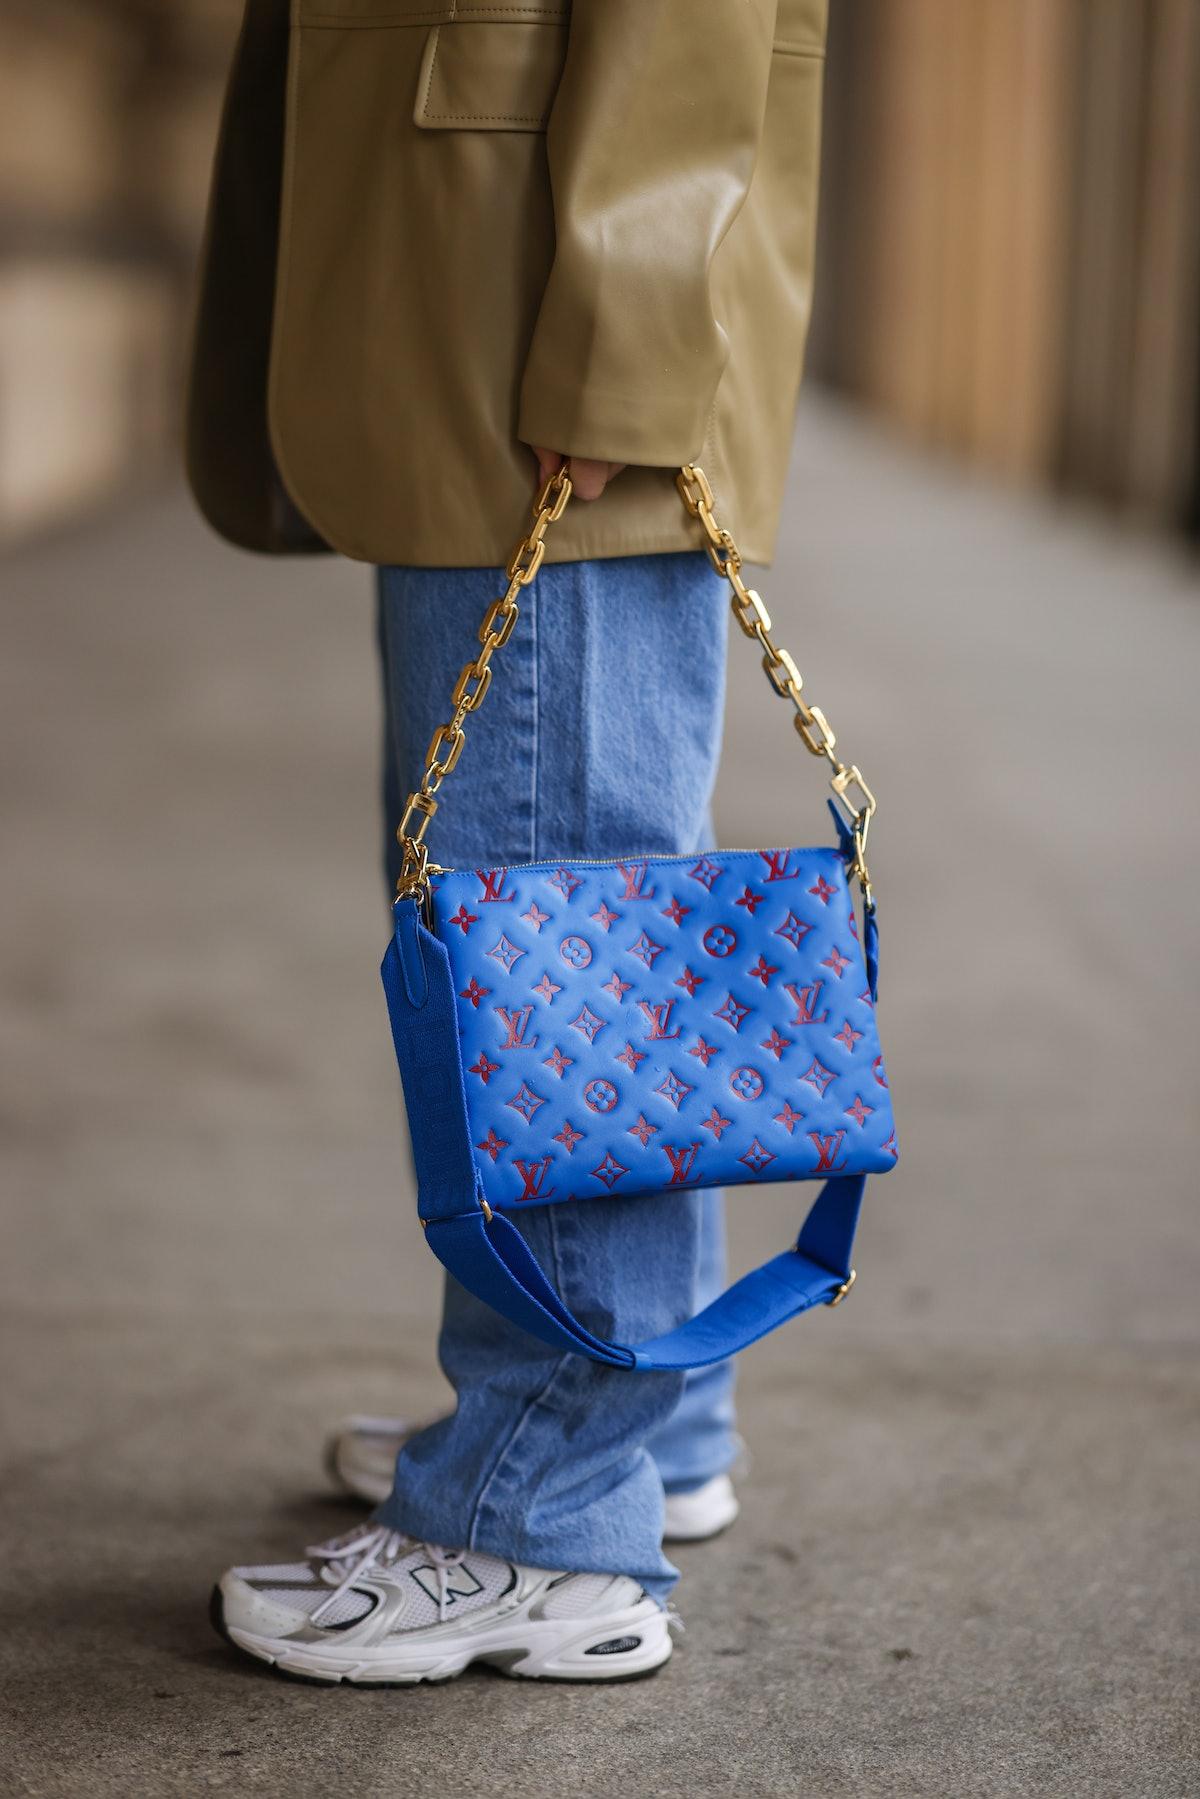 Sonia Lyson wearing New Balance sneakers, Pull & Bear blue baggy jeans, beige 12 Storeez leather bla...